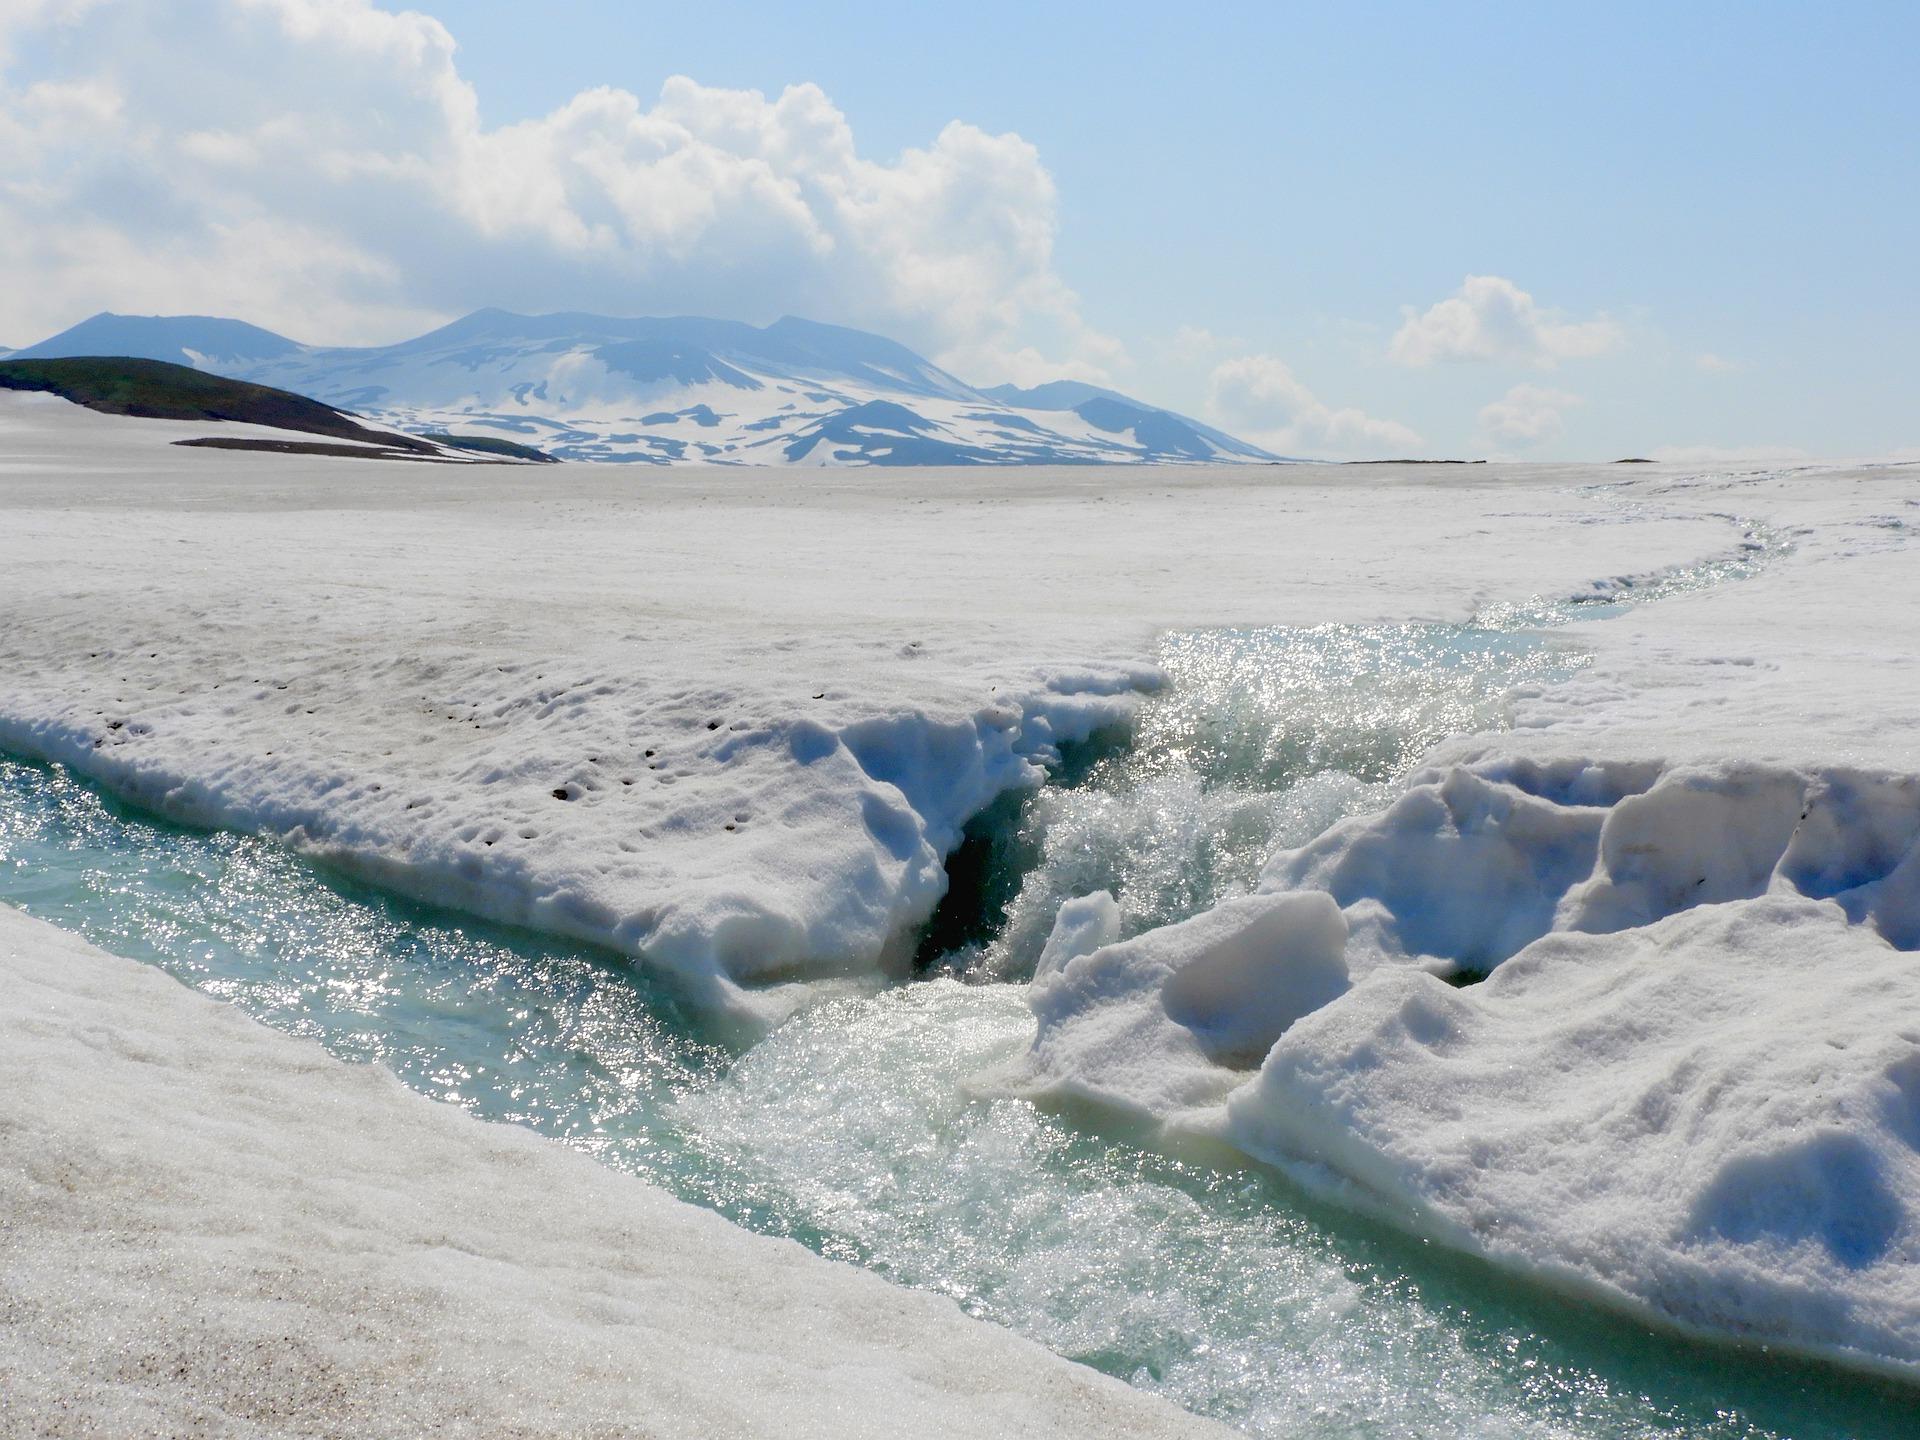 Tchoukotka-Kamchatka-La-Datcha-Heliski-Russia-14